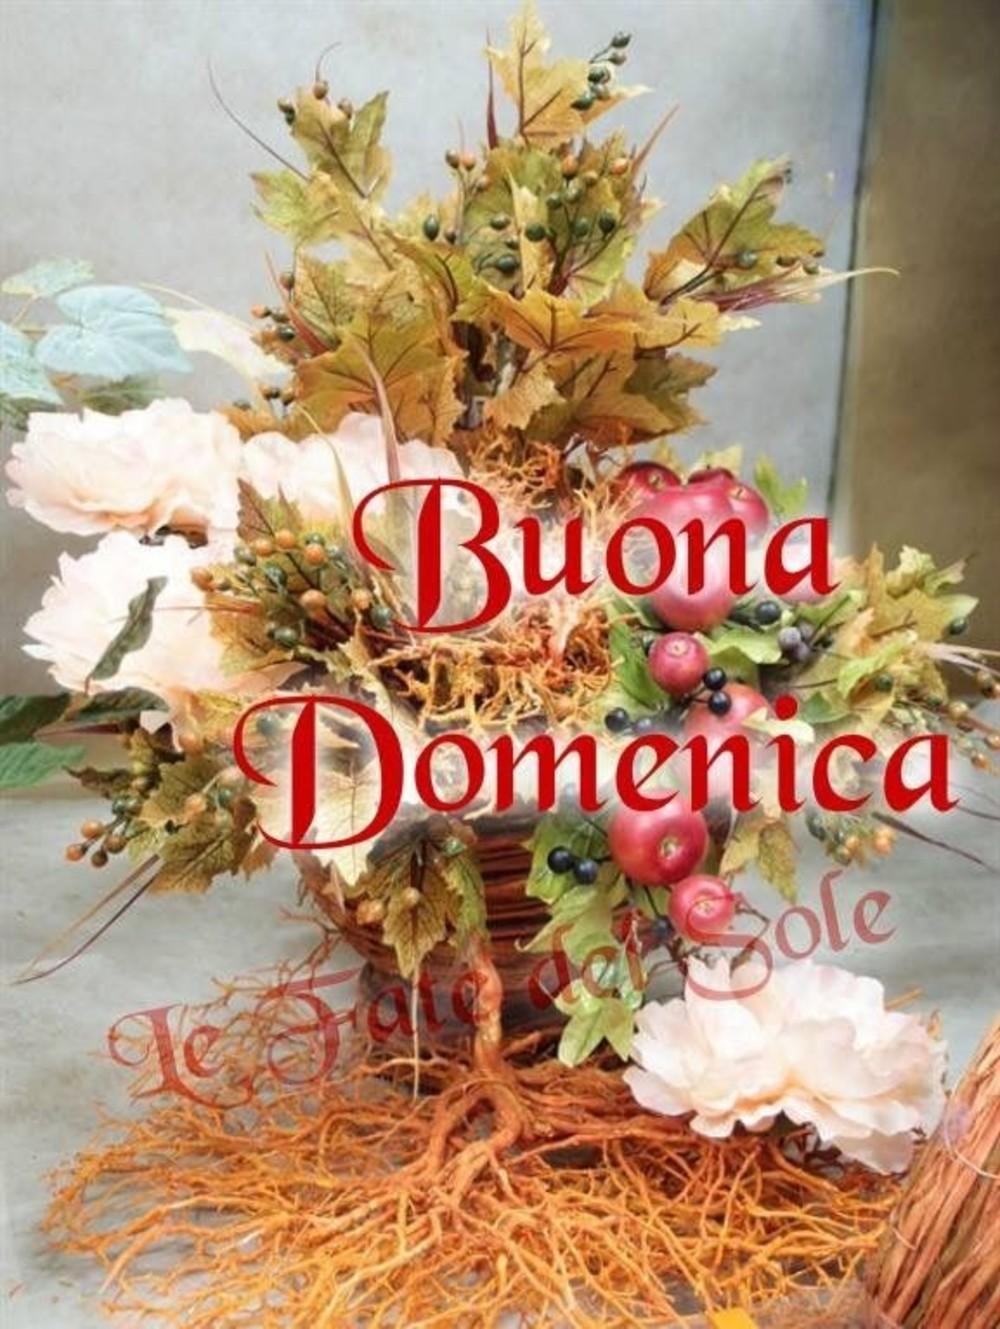 Belle Immagini Felice Domenica Autunnale 1 Fotowhatsapp It